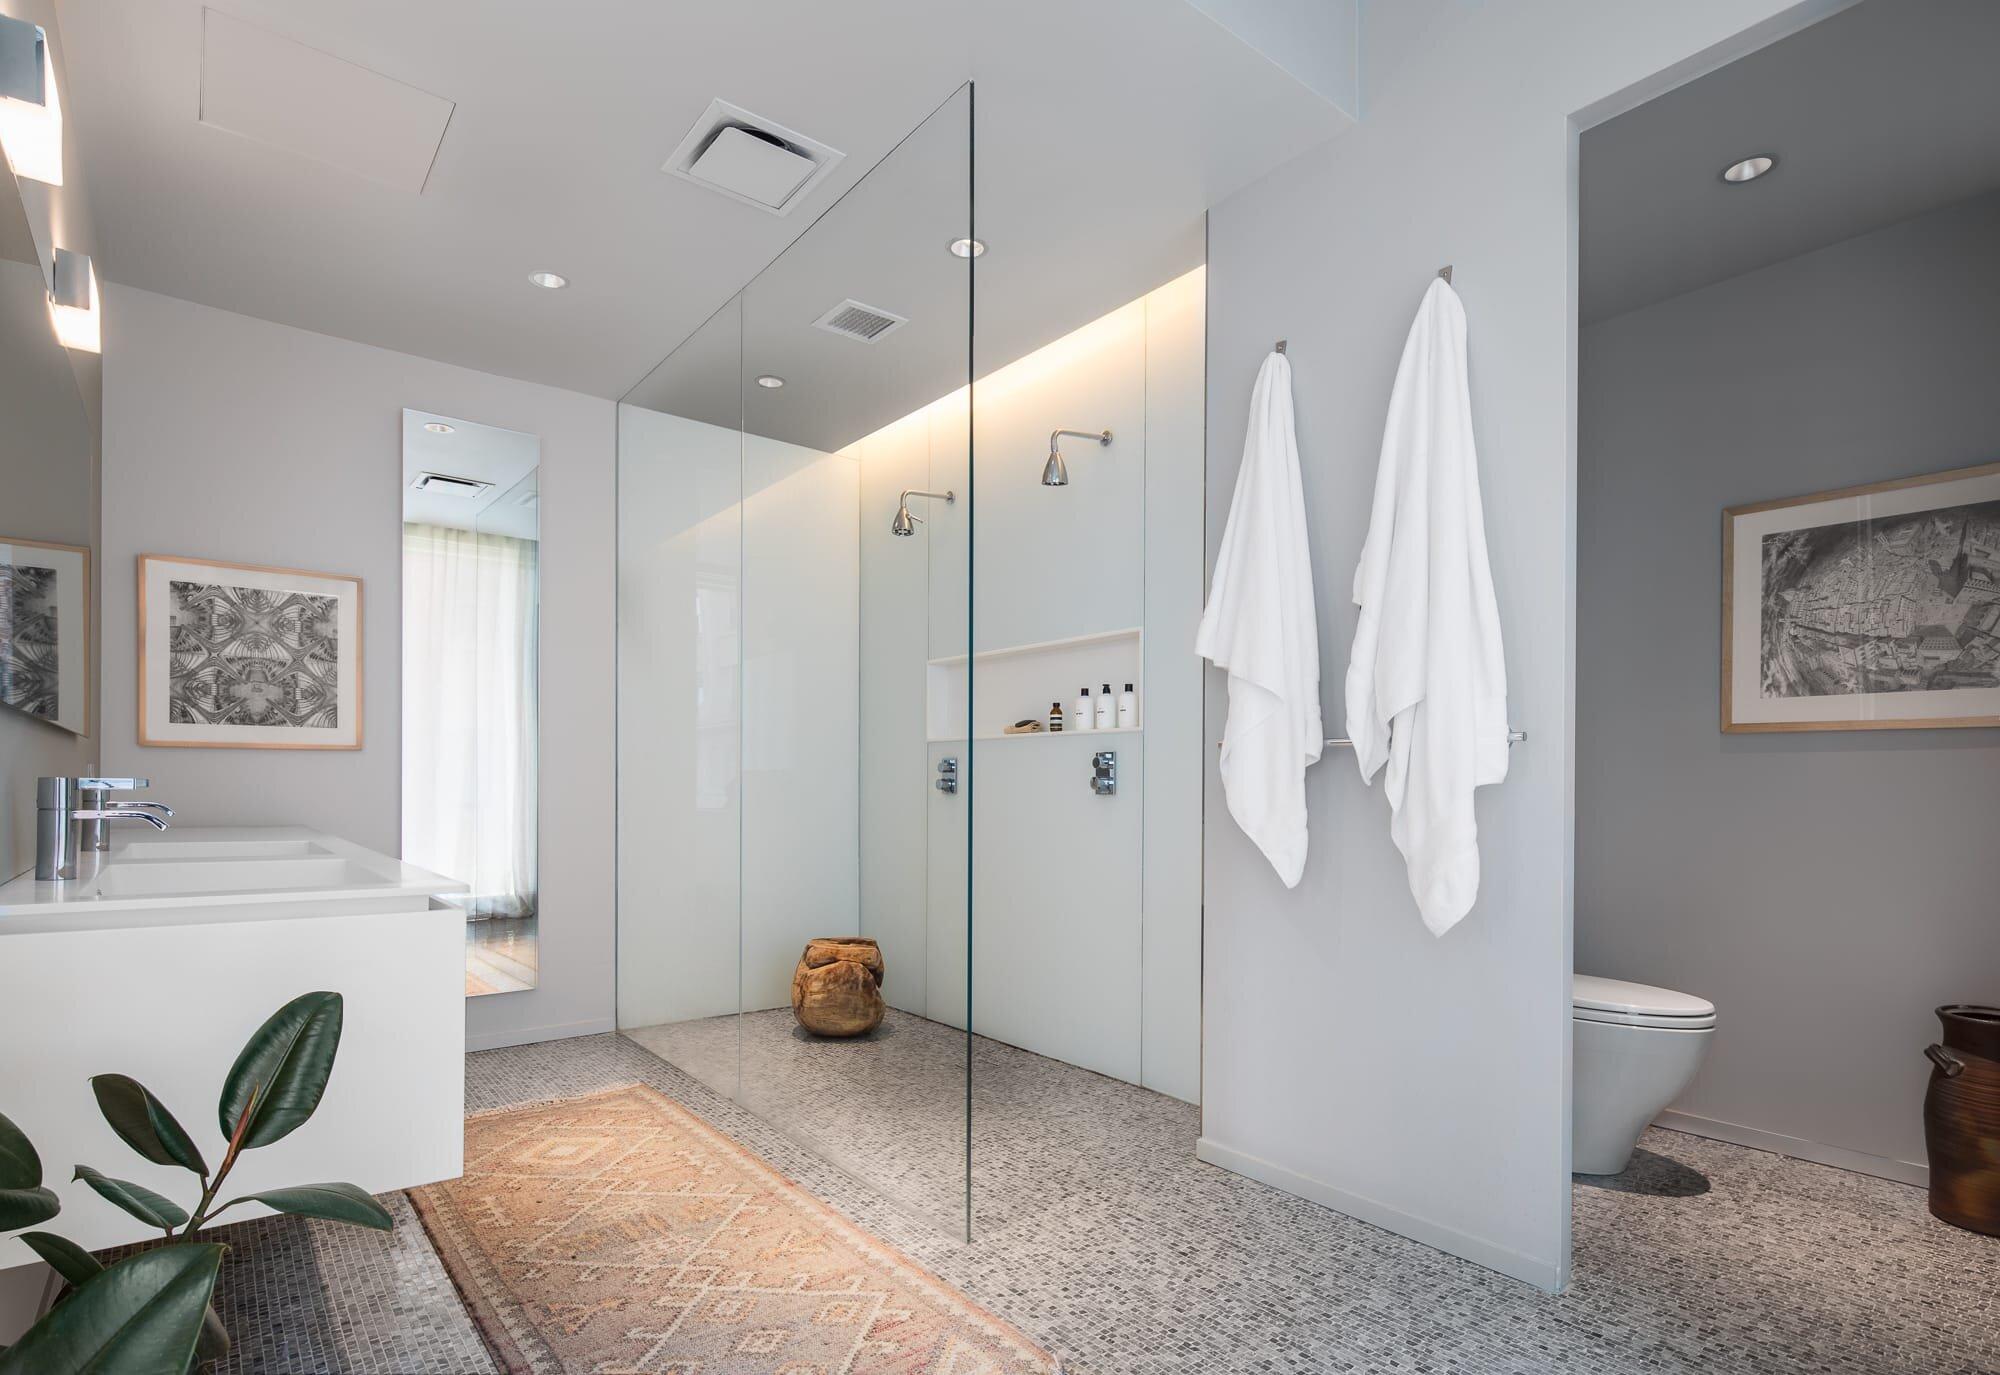 Master Bathroom designed by Alloy Development